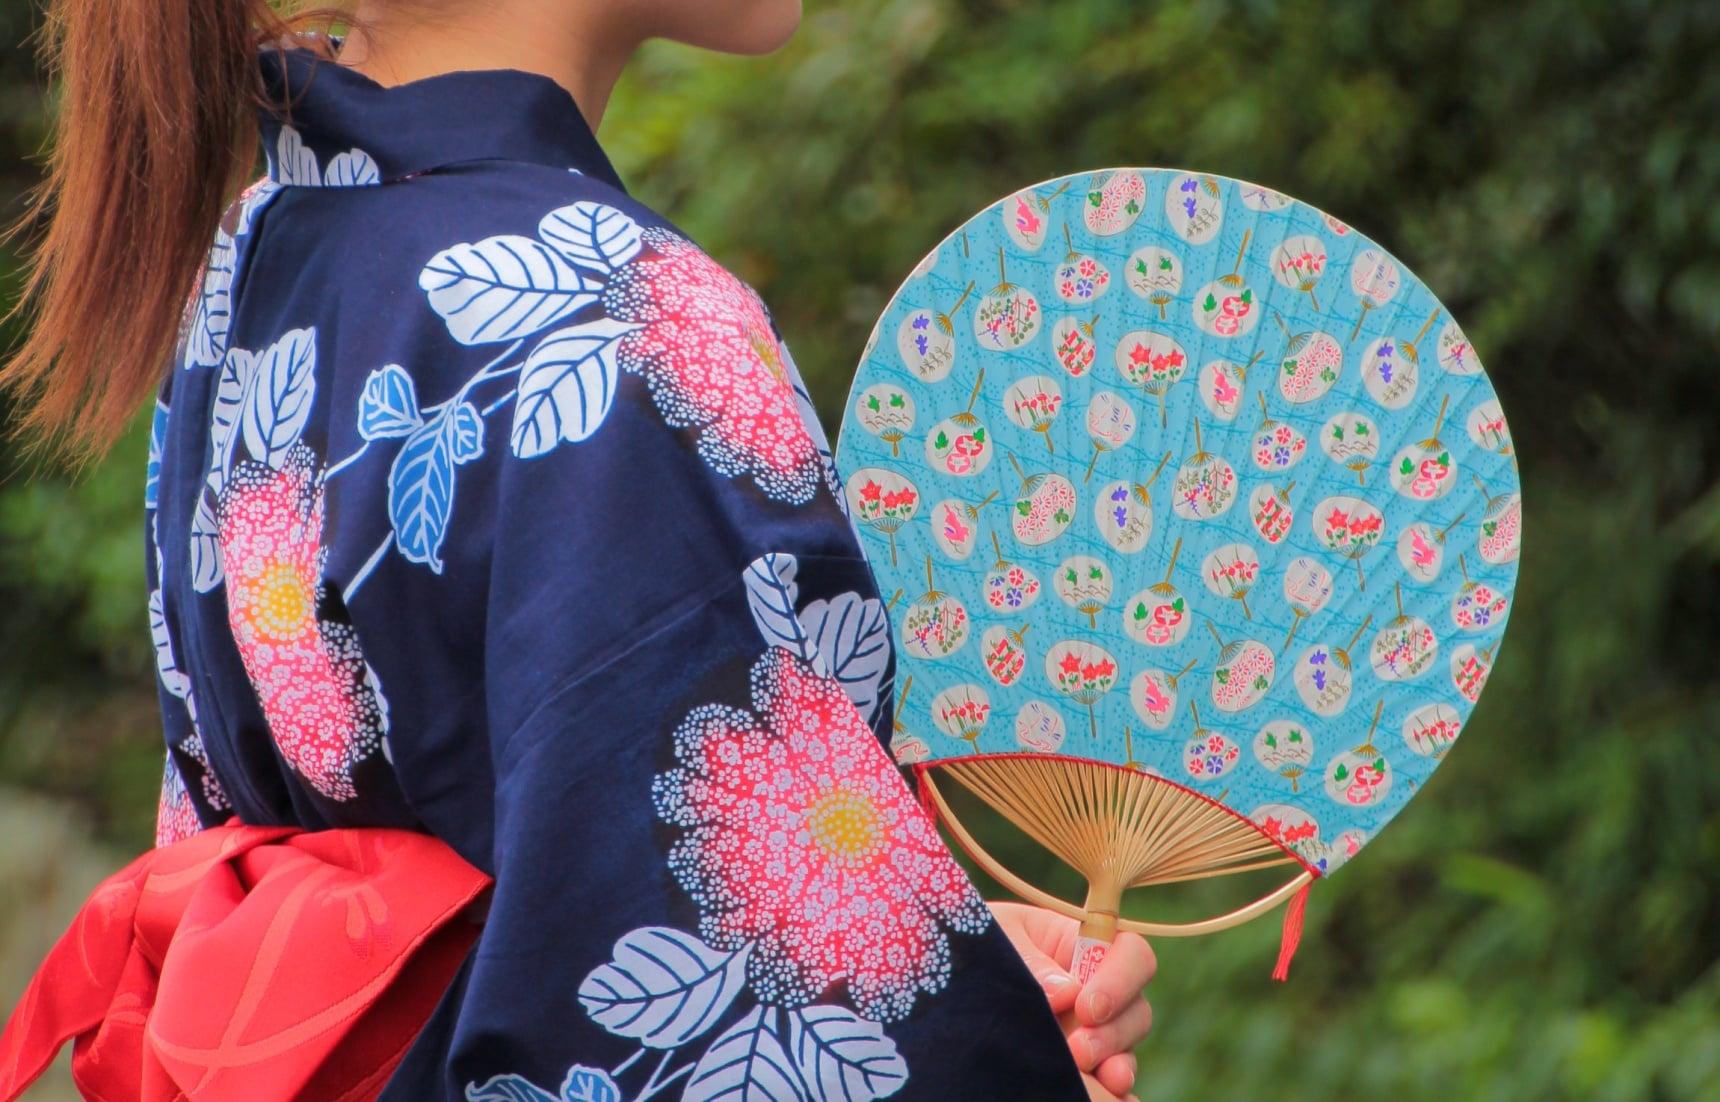 4 Useful Supplies for Summer Festivals